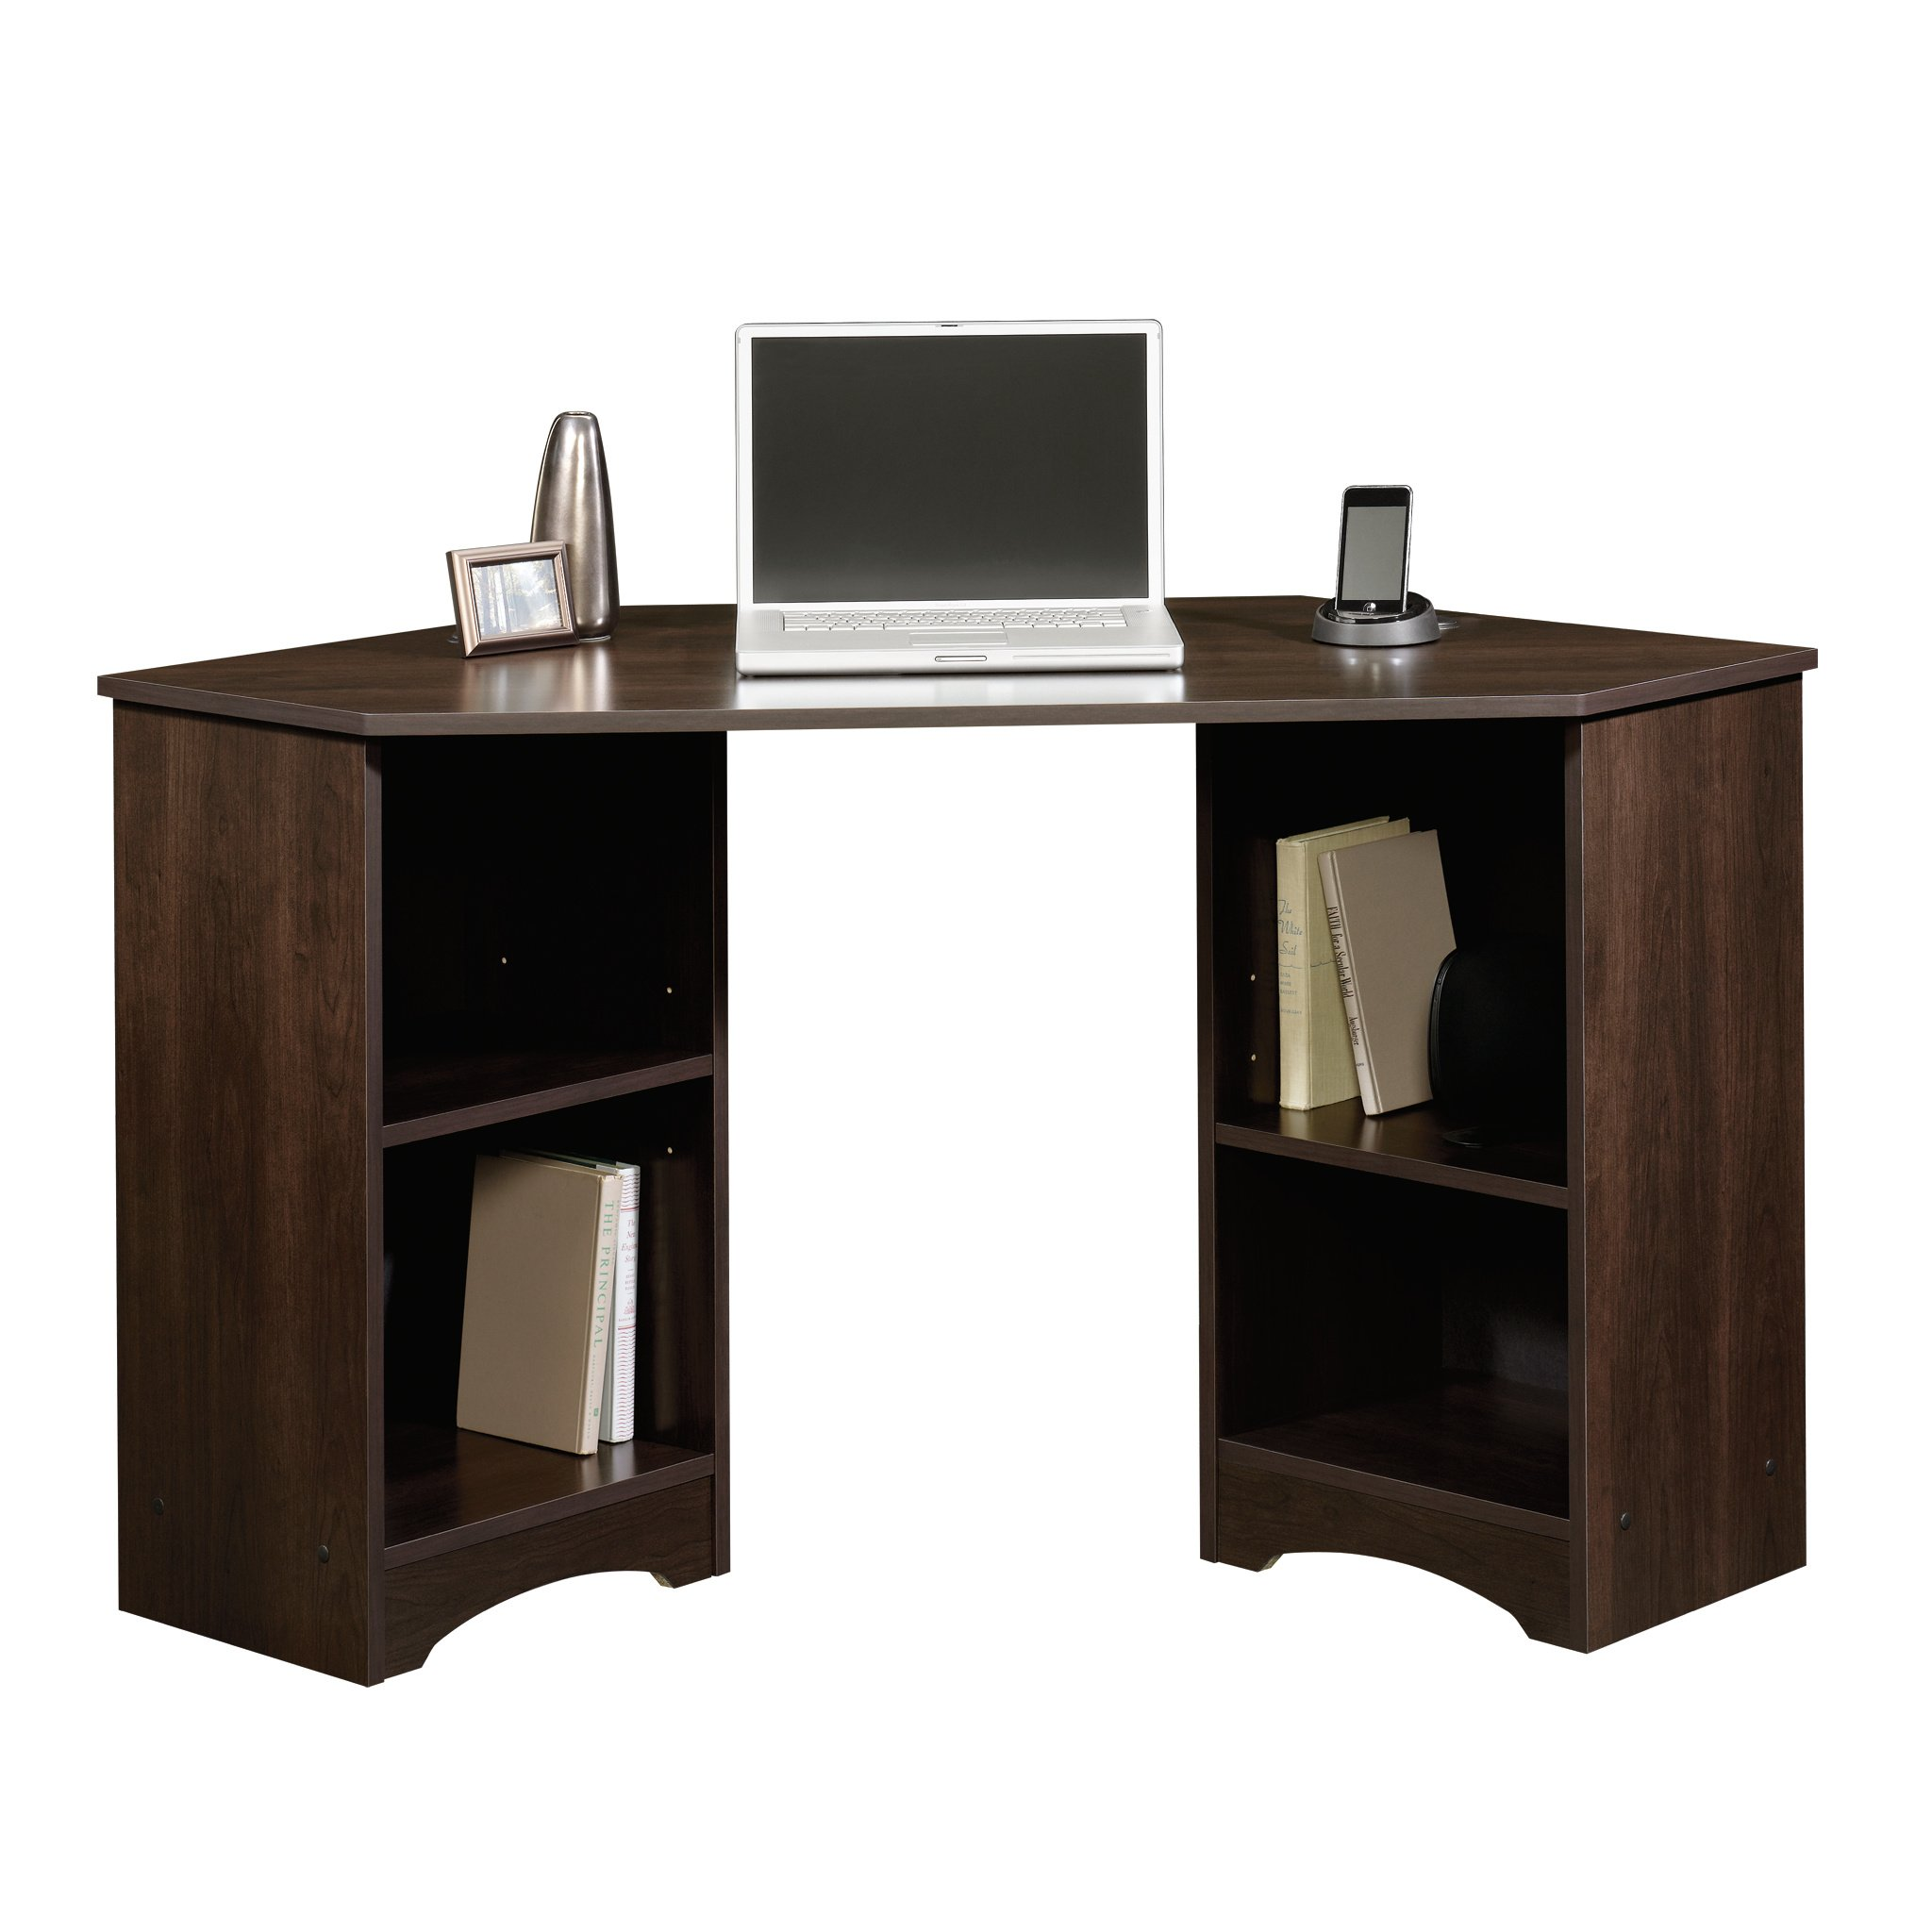 Sauder 413073 Beginnings Corner Desk, L: 53.15'' x W: 23.47'' x H: 28.74'', Cinnamon Cherry finish by Sauder